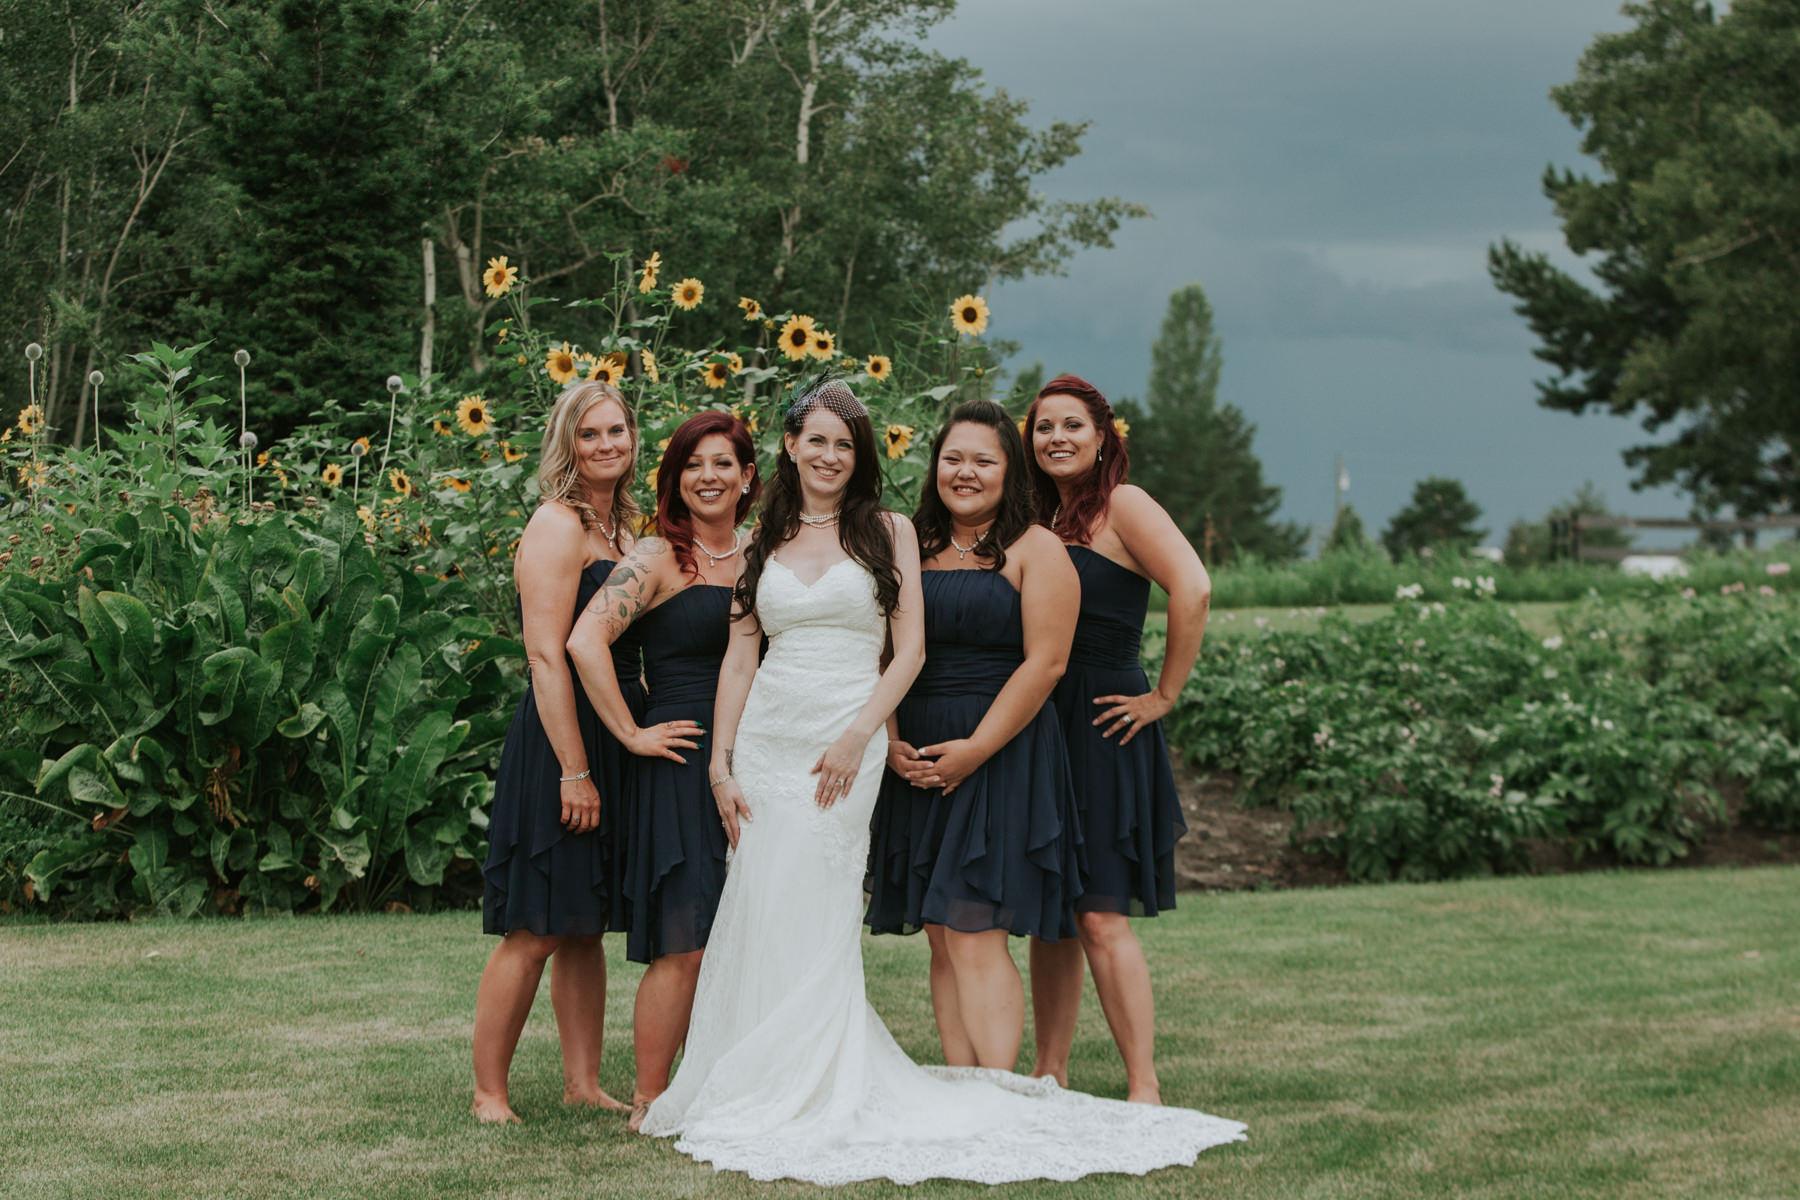 Vancouver Wedding Photographer Pam (59).jpg